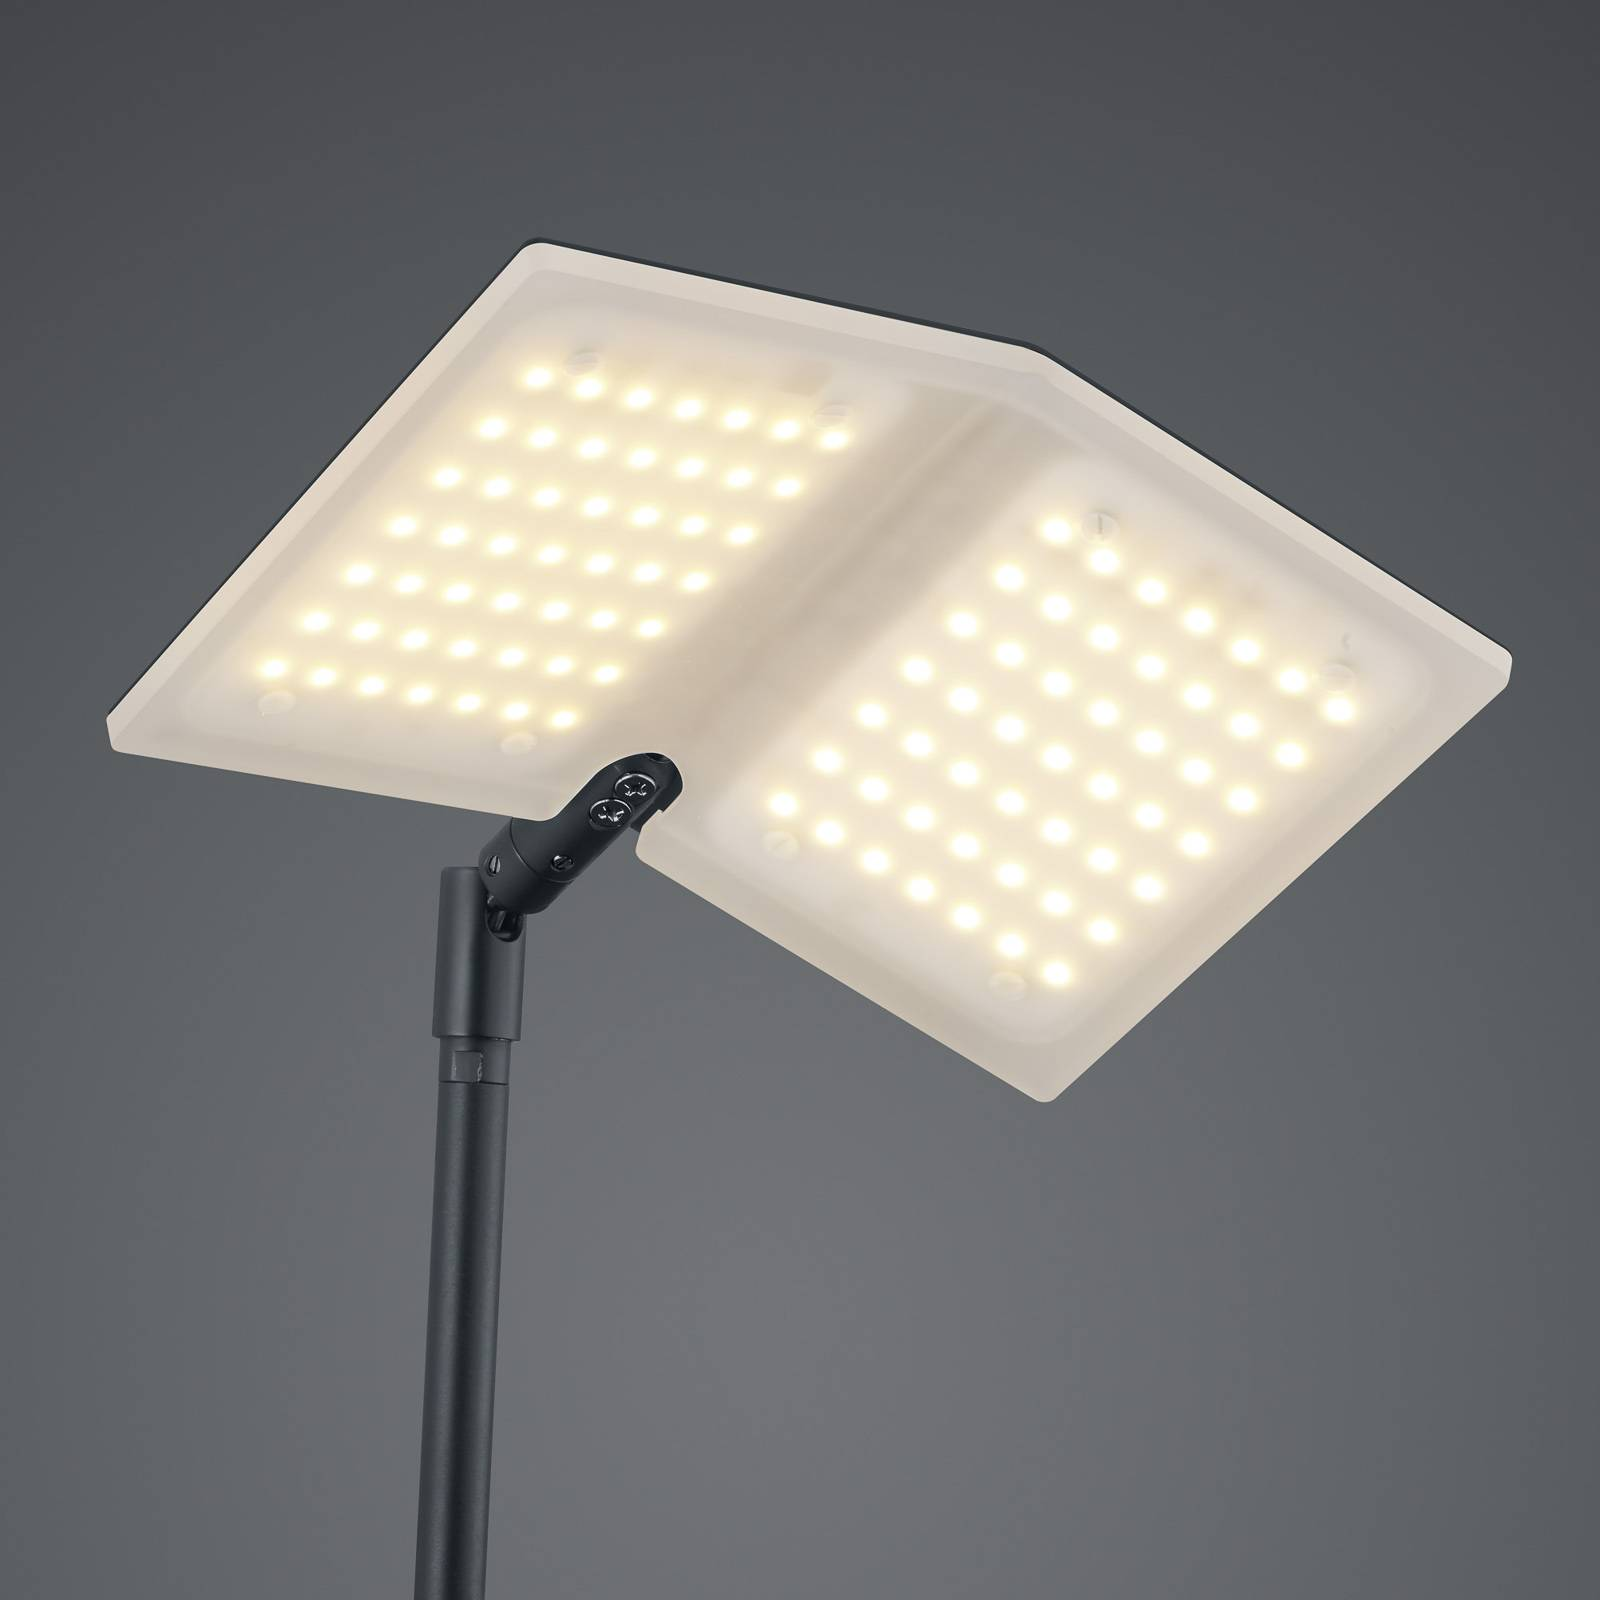 BANKAMP Book LED-lattiavalaisin, musta